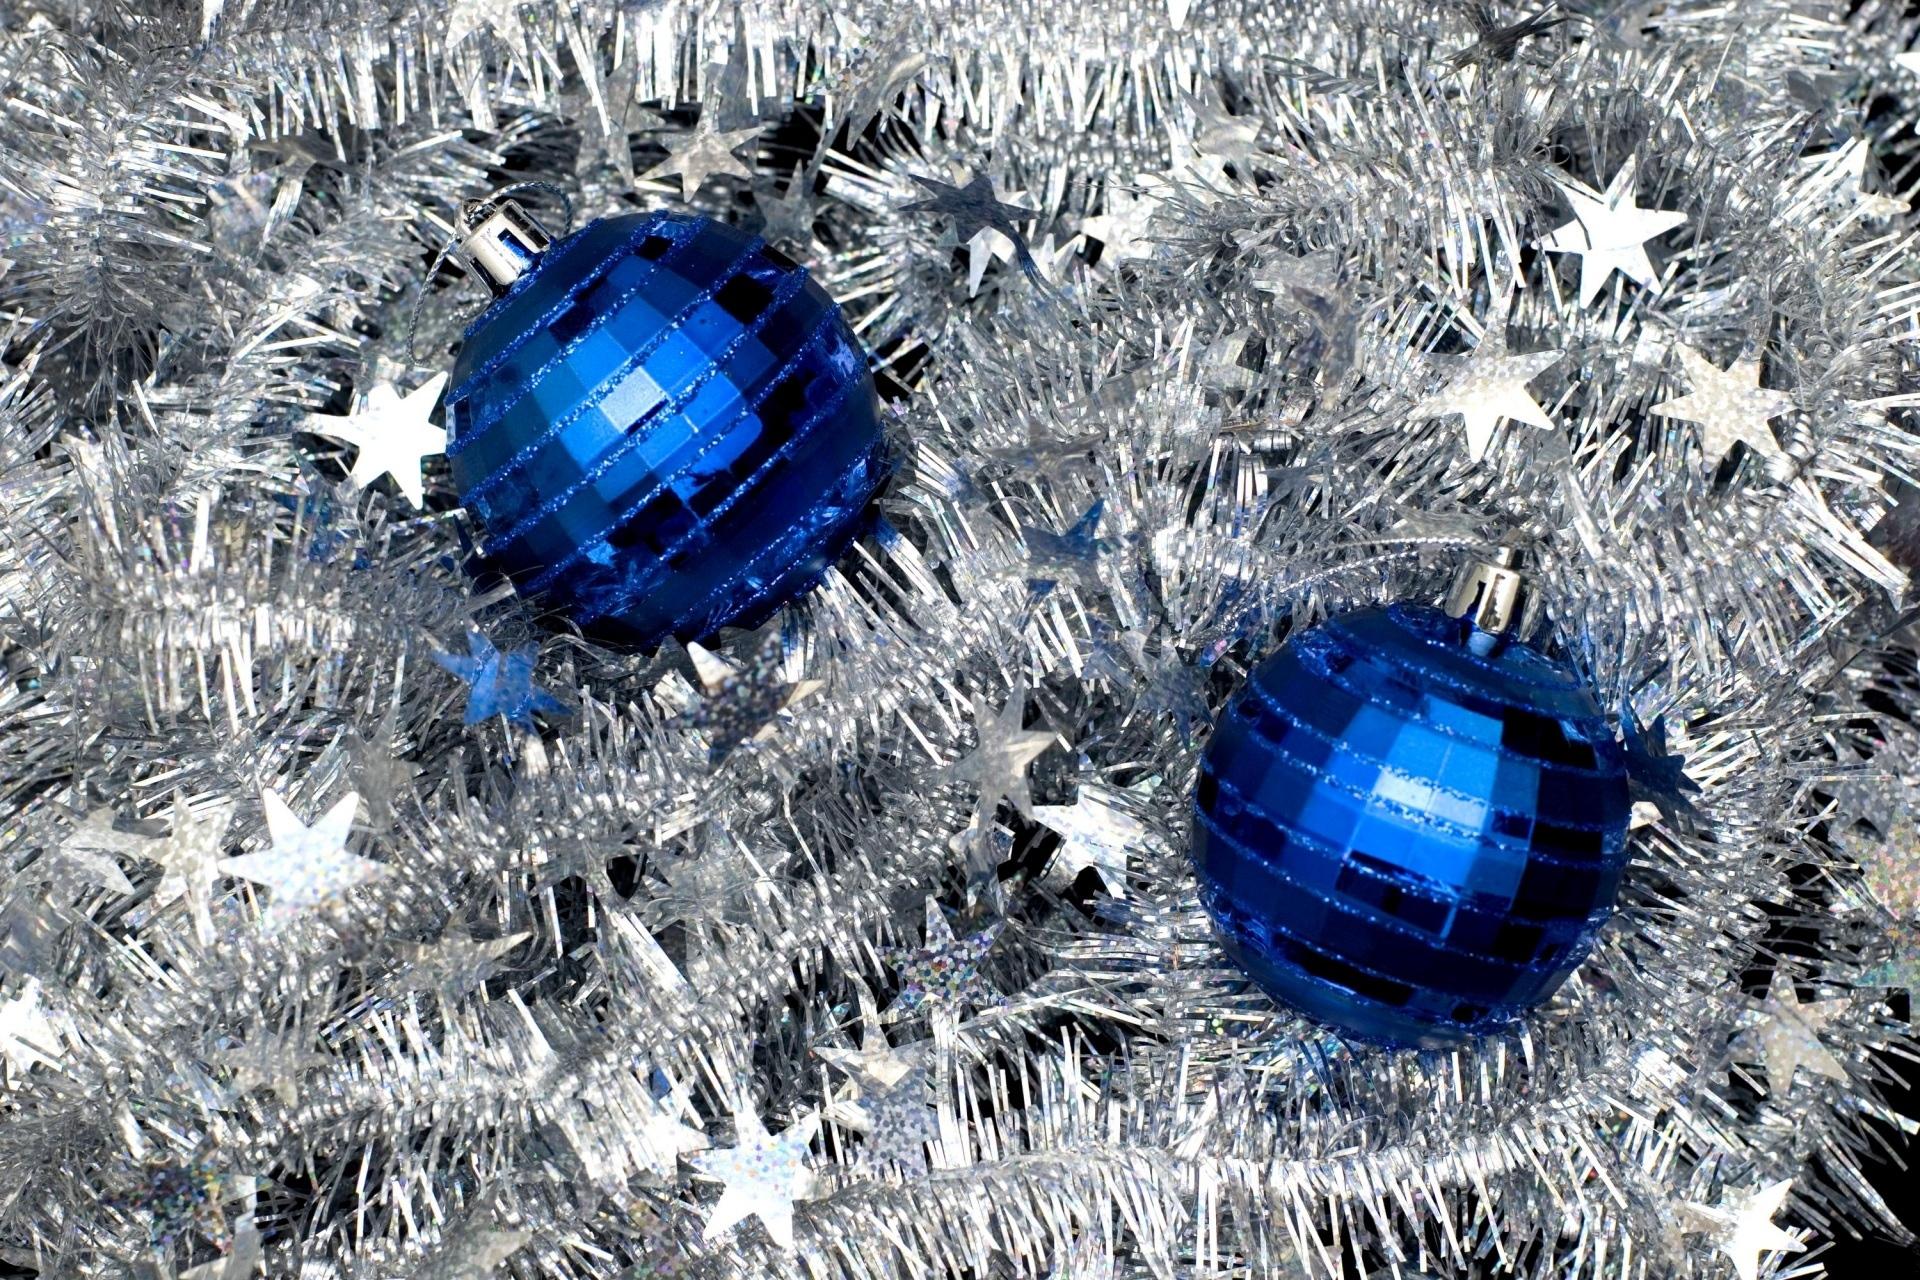 Decoration Silver Stars Bauble Blue 1920x1280